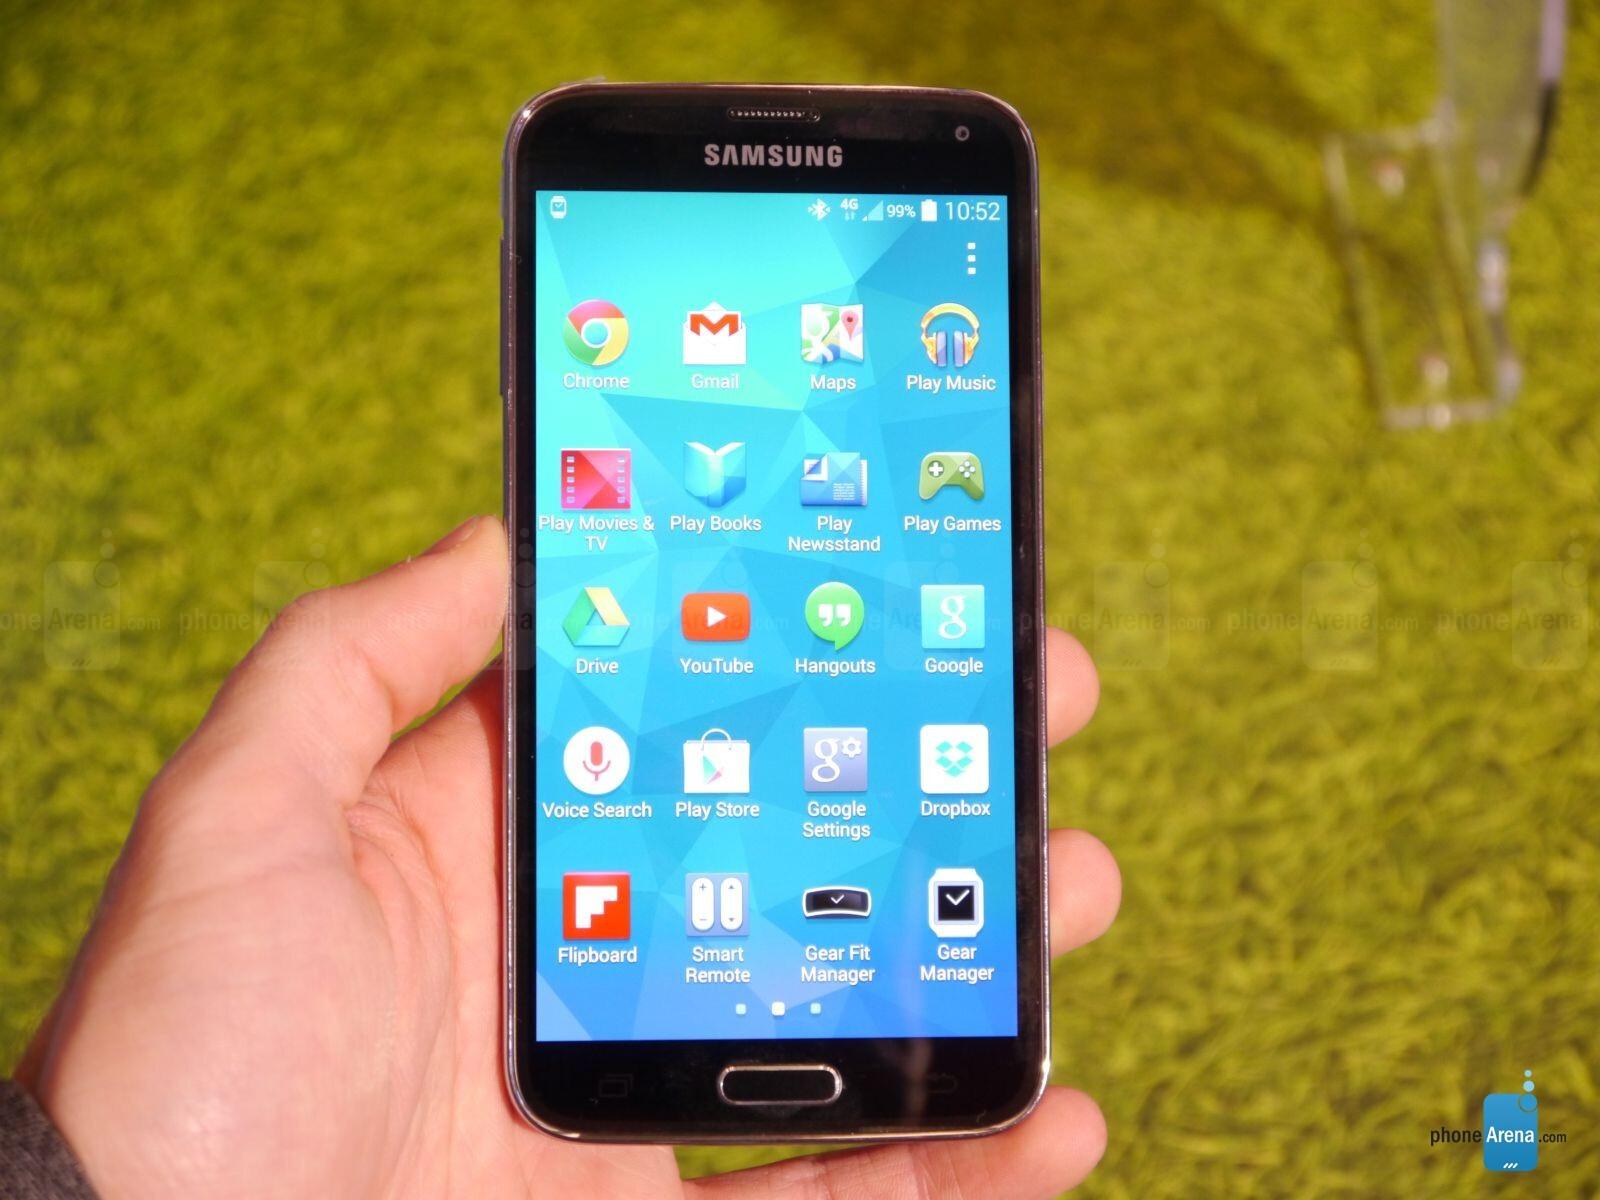 Spring chickens: Samsung Galaxy S5 vs Sony Xperia Z2 comparison preview |  PhoneArena reviews - PhoneArena